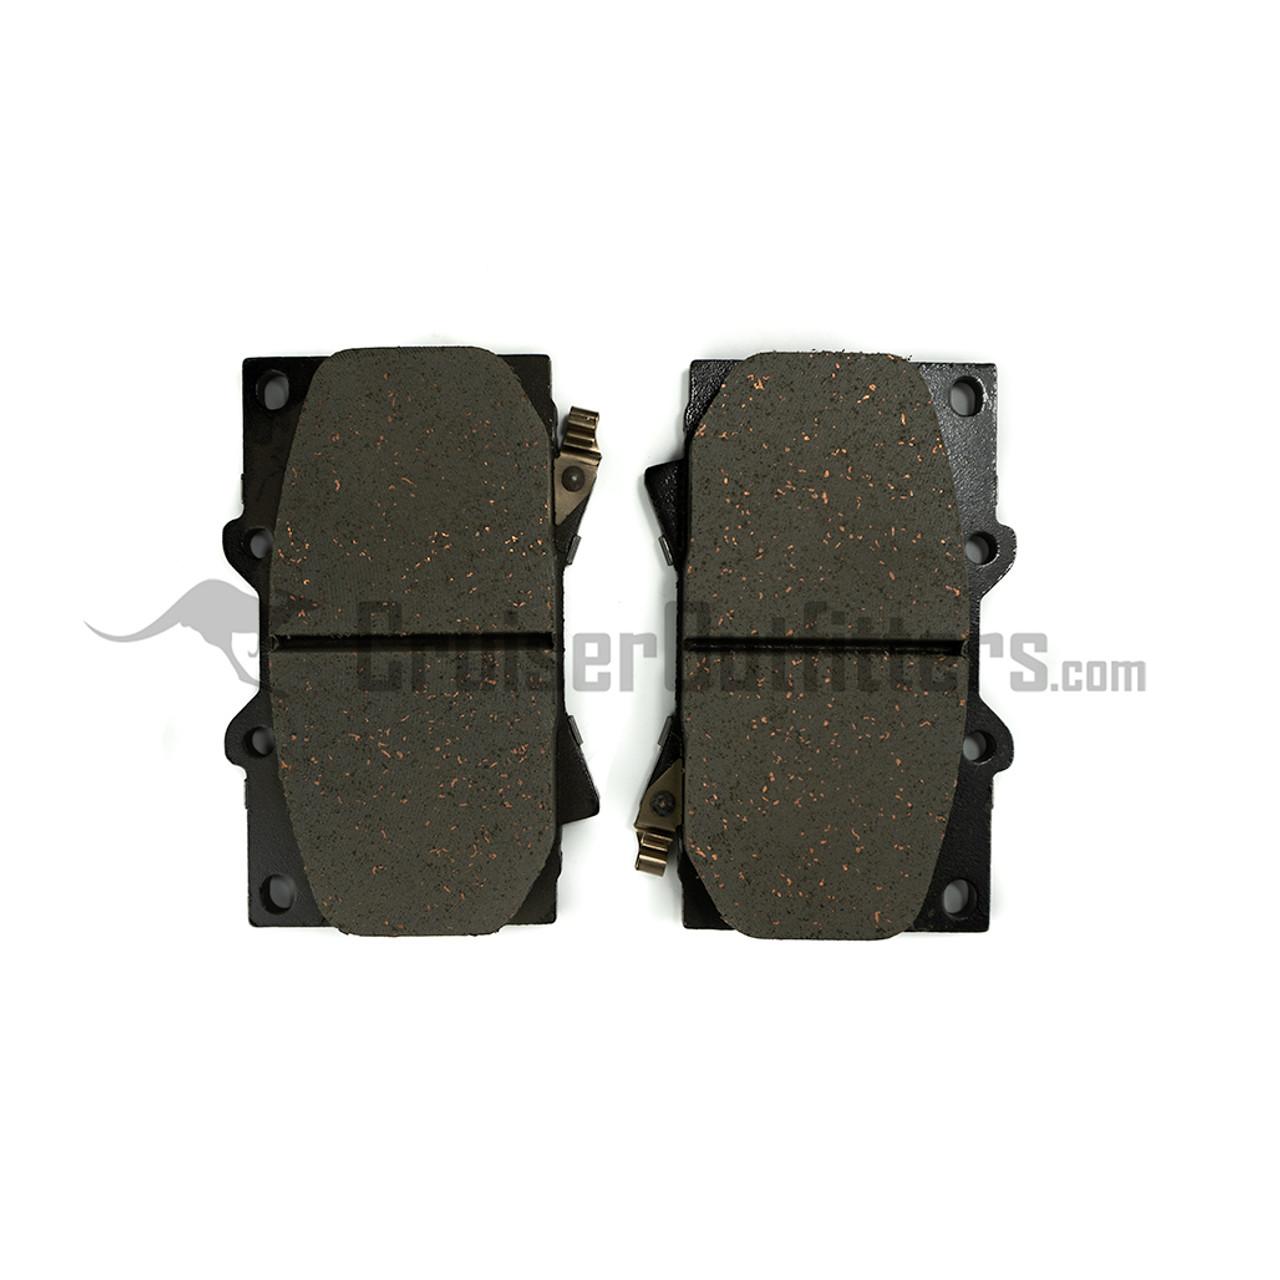 BRAD0772 - Front Brake Pads - Fits 1998 - 2007 100 Series (ADVICS)